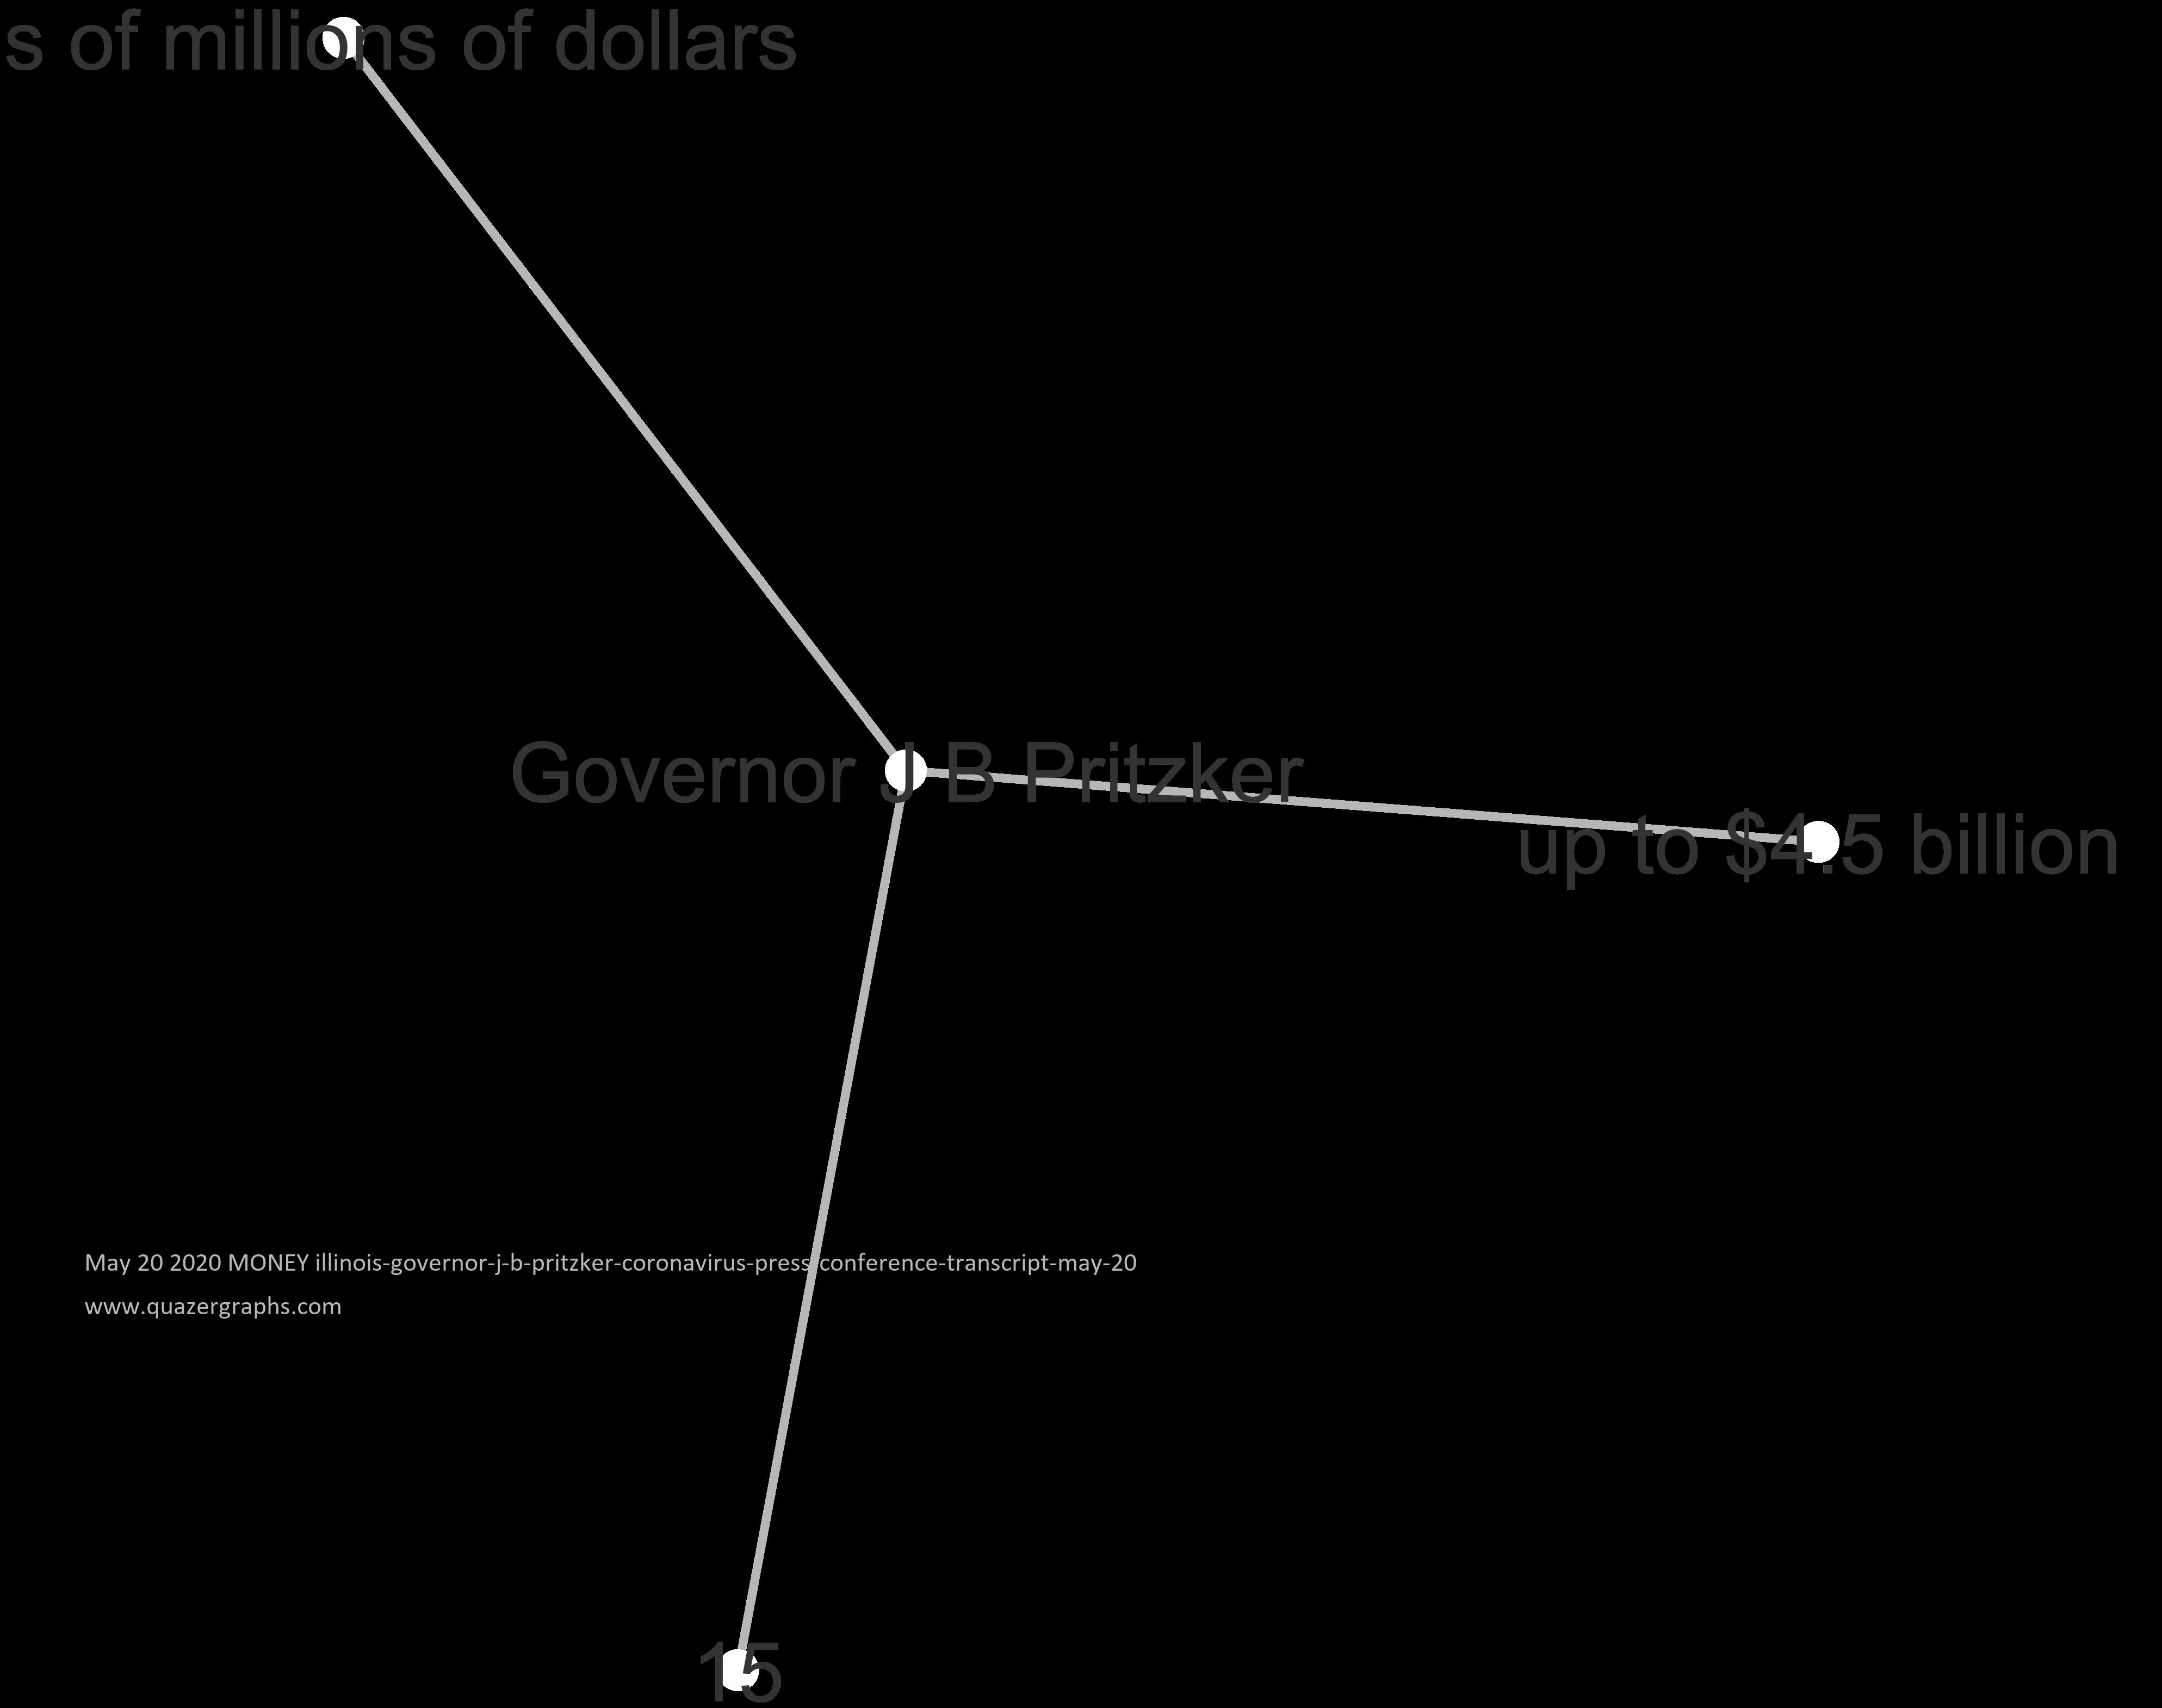 May 20 2020 MONEY illinois-governor-j-b-pritzker-coronavirus-press-conference-transcript-may-20